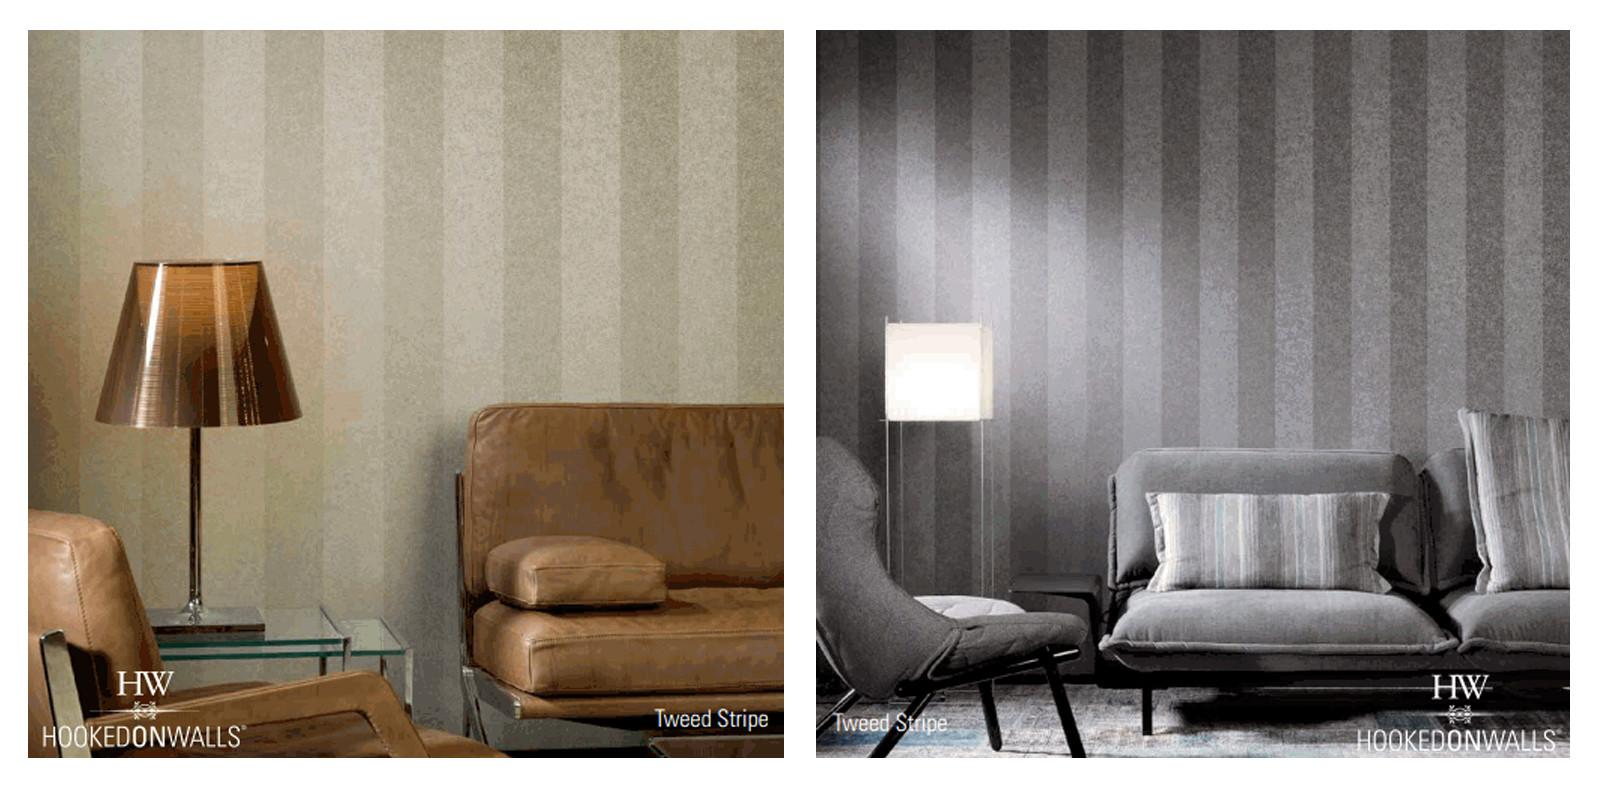 Hookedonwalls-Tweed-Stripe